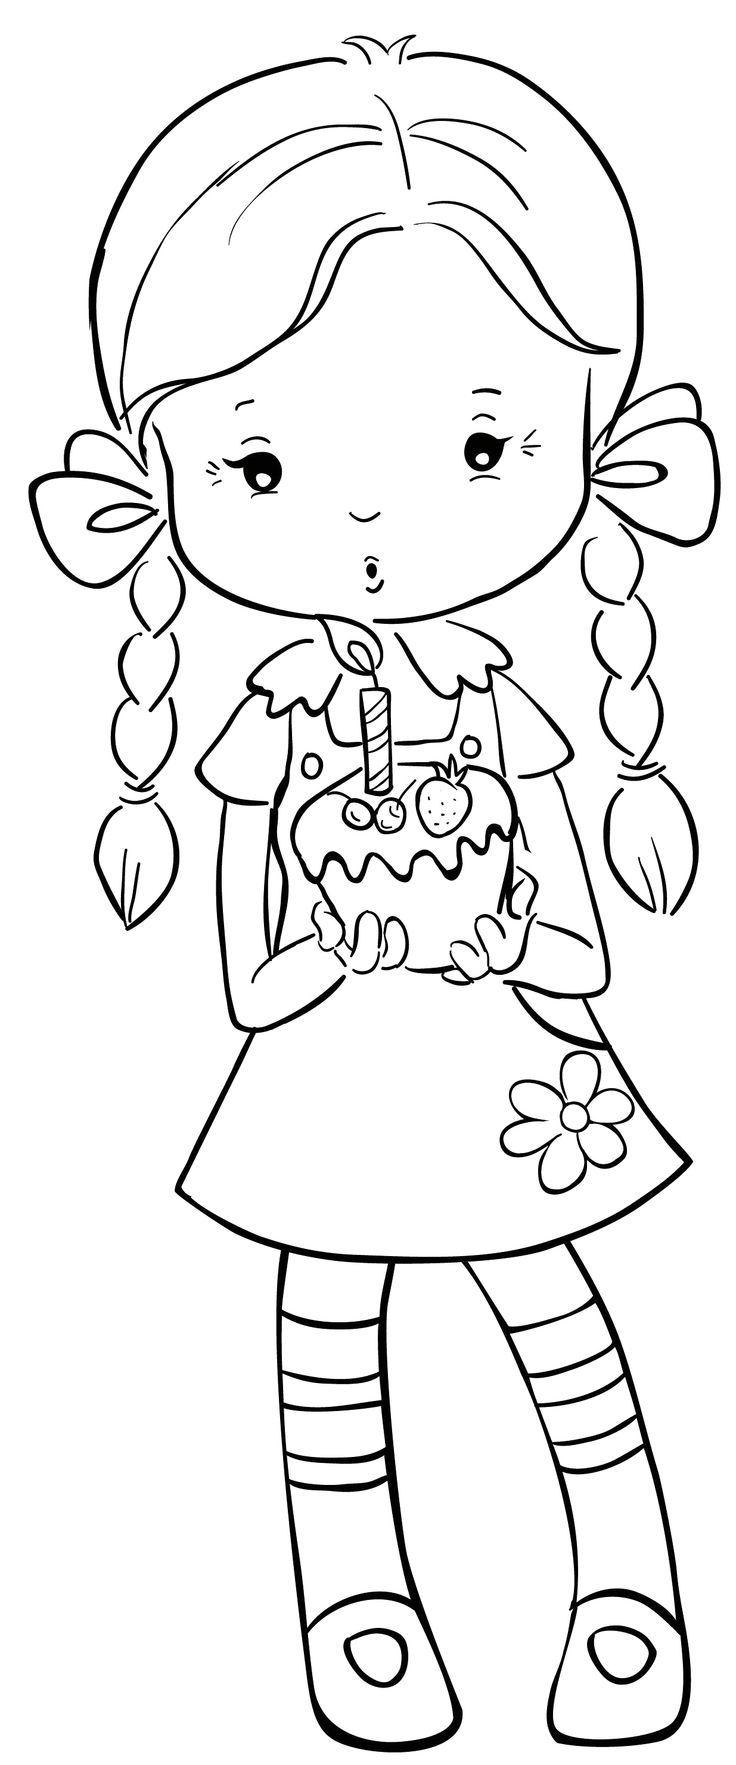 doll stamp with braids - Google Search | para pintar | Pinterest ...